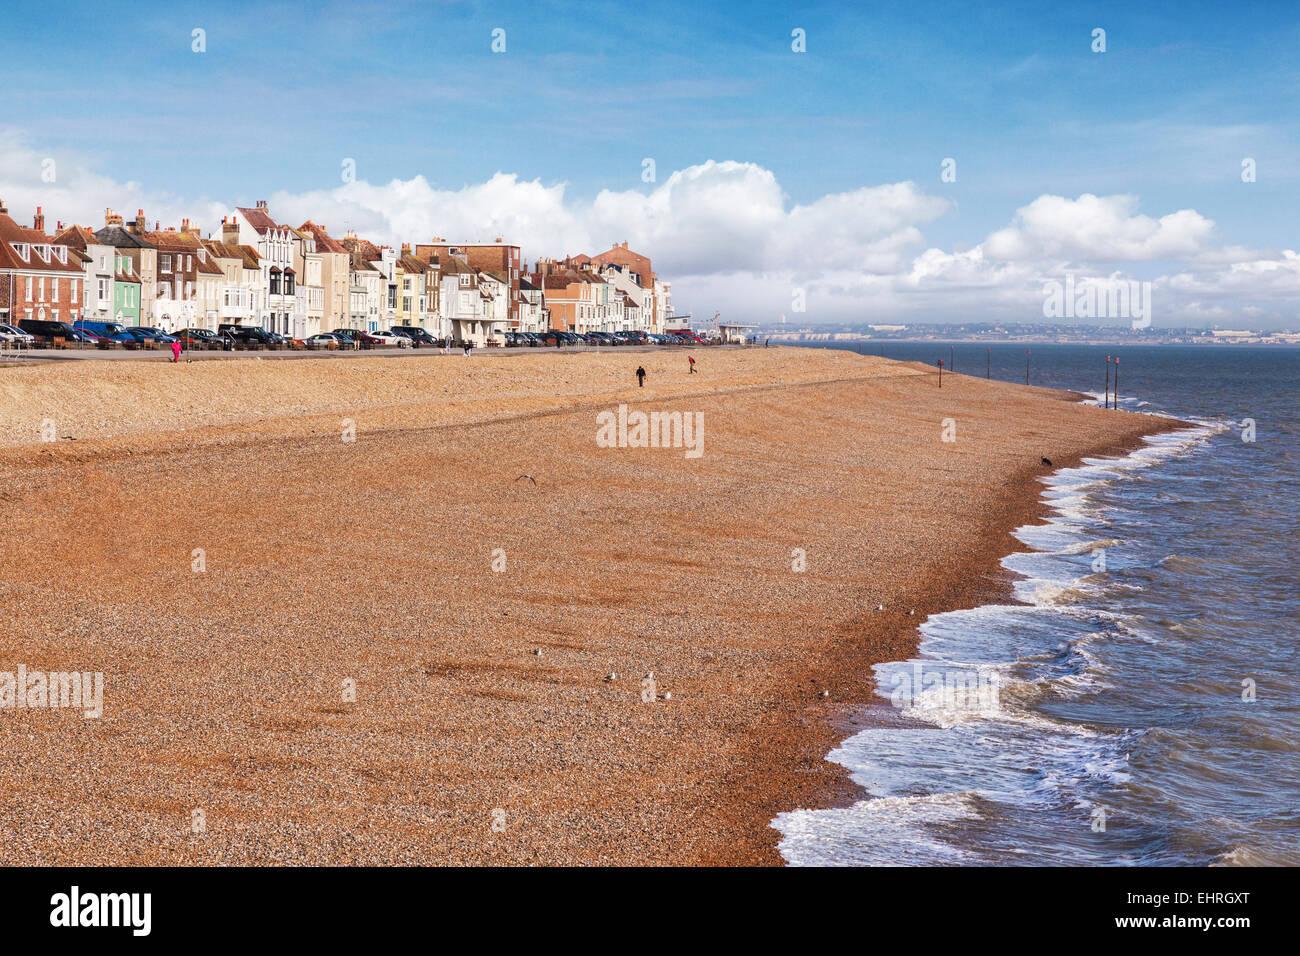 La playa en frente, Kent, Inglaterra, Reino Unido. Imagen De Stock